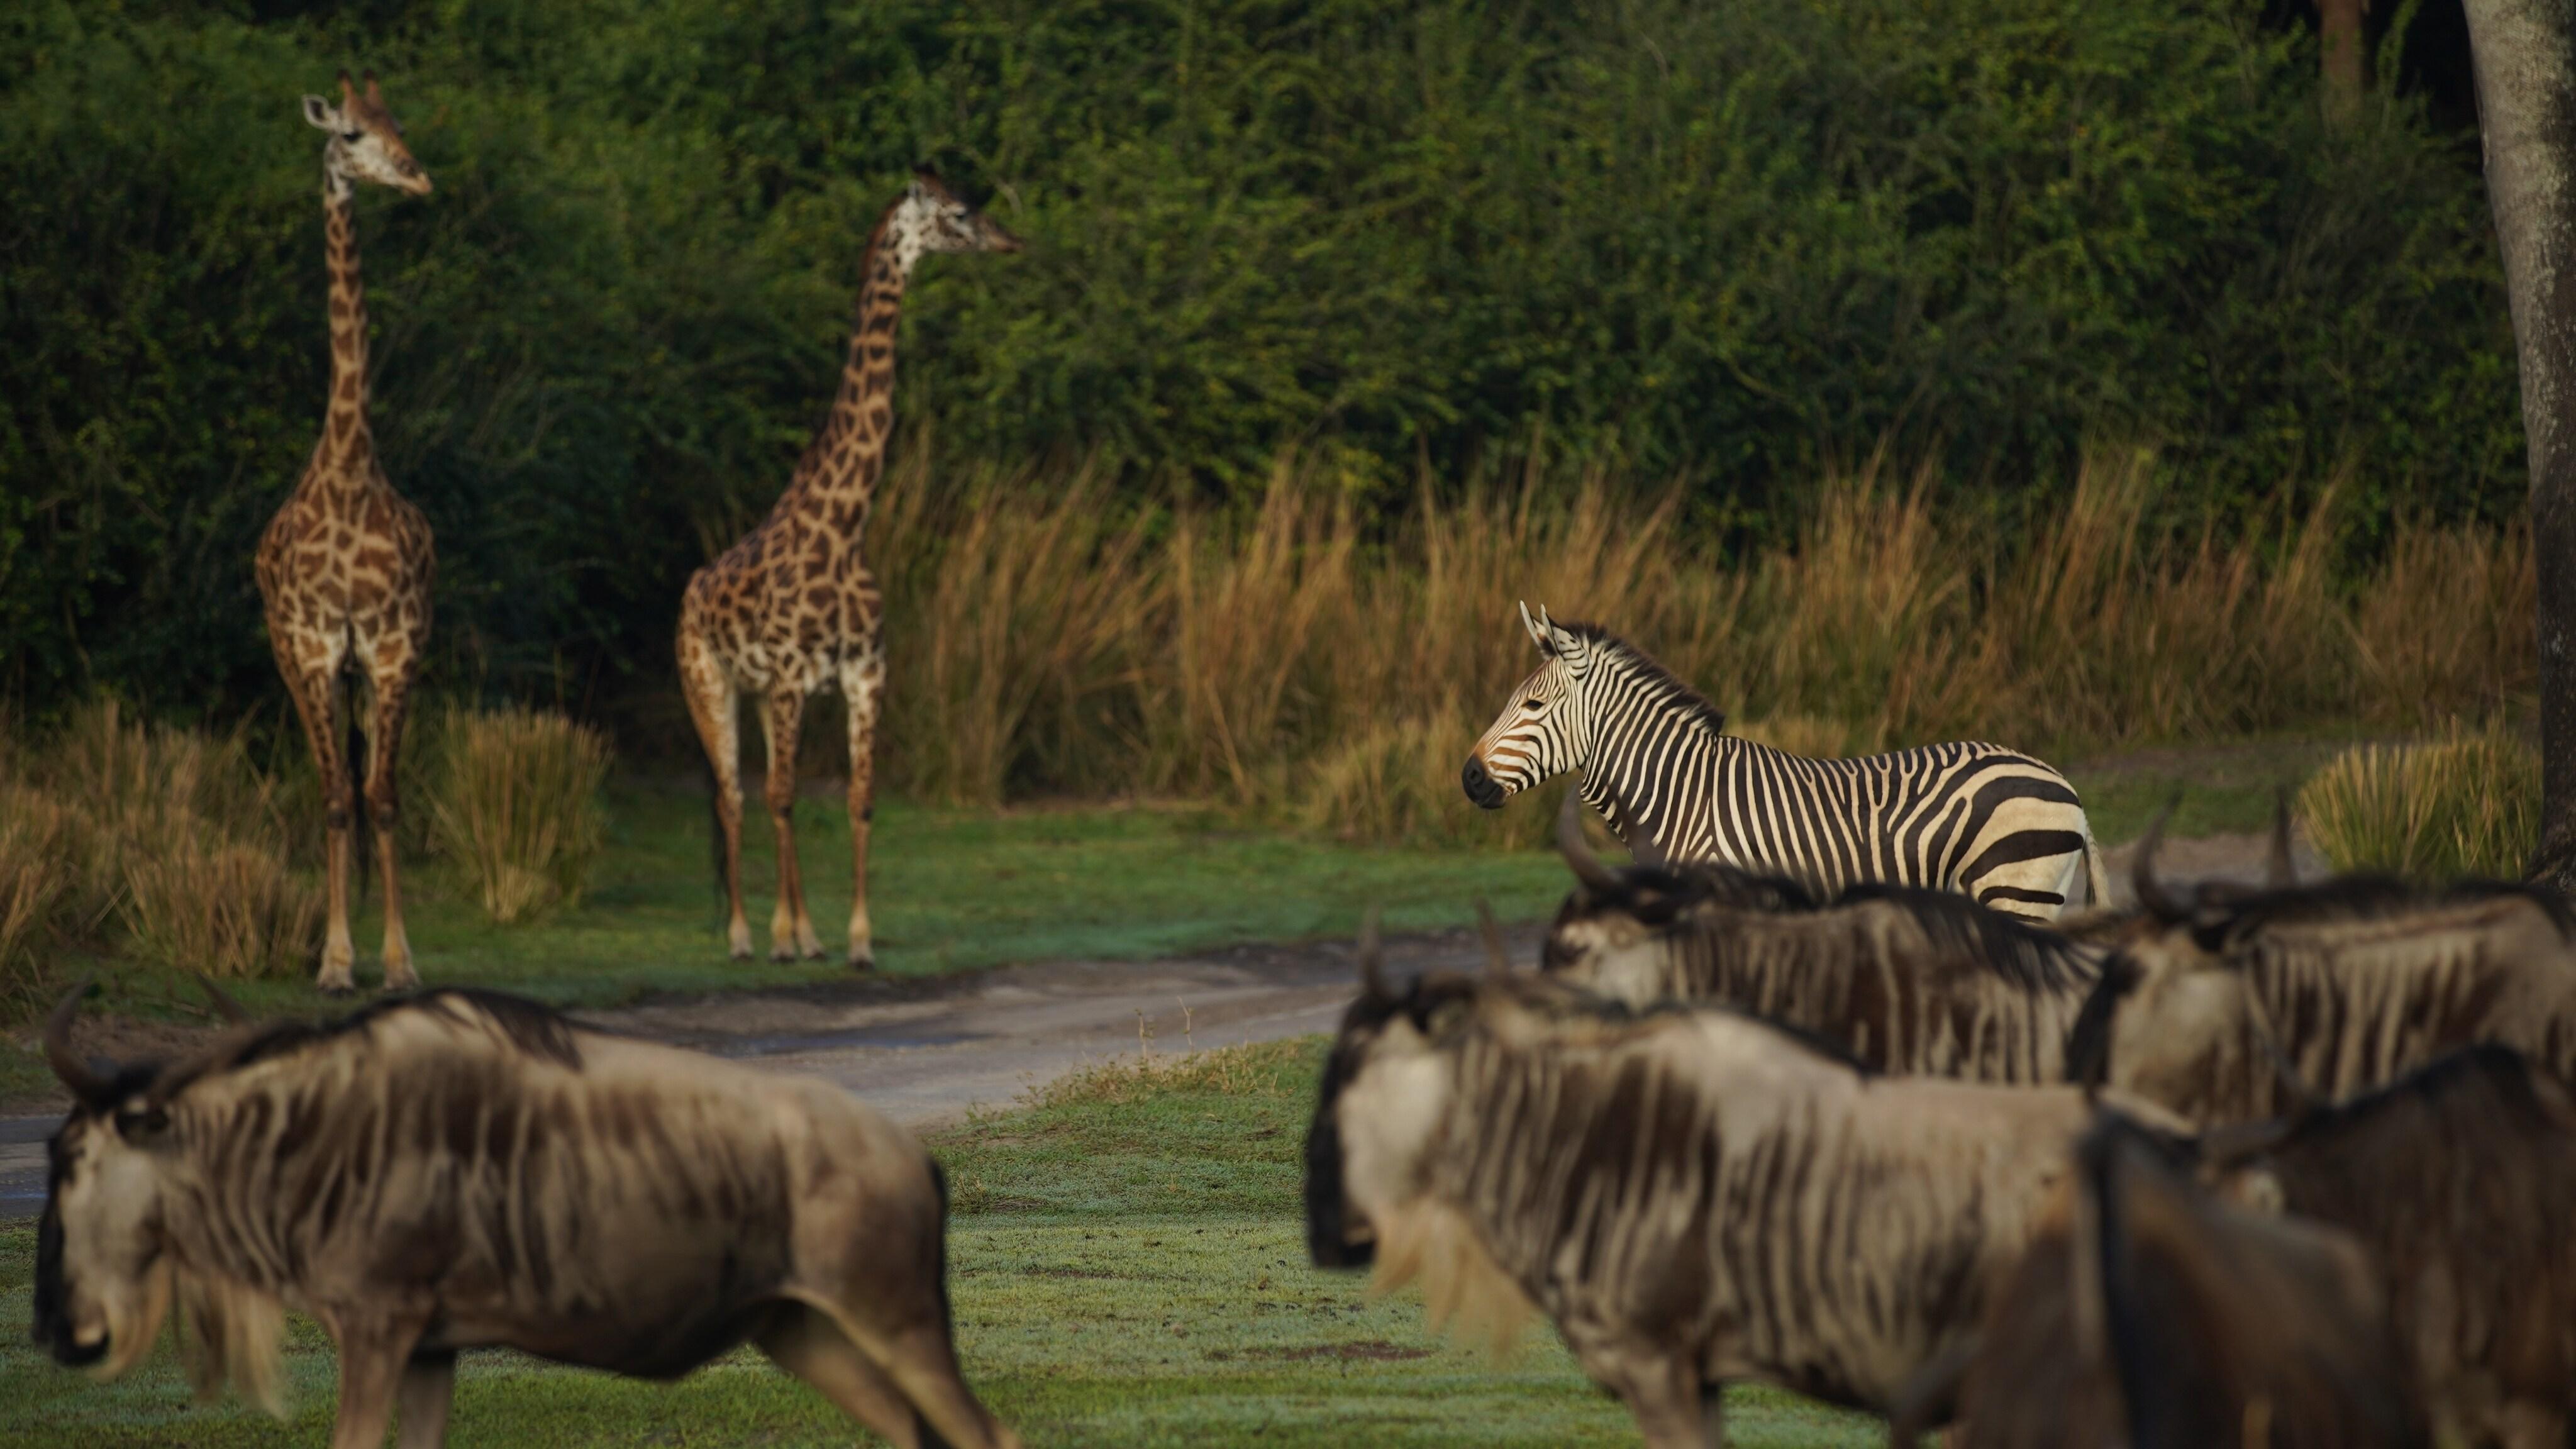 Prima the Hartmann's Mountain Zebra with wildebeest and giraffes. (Disney)